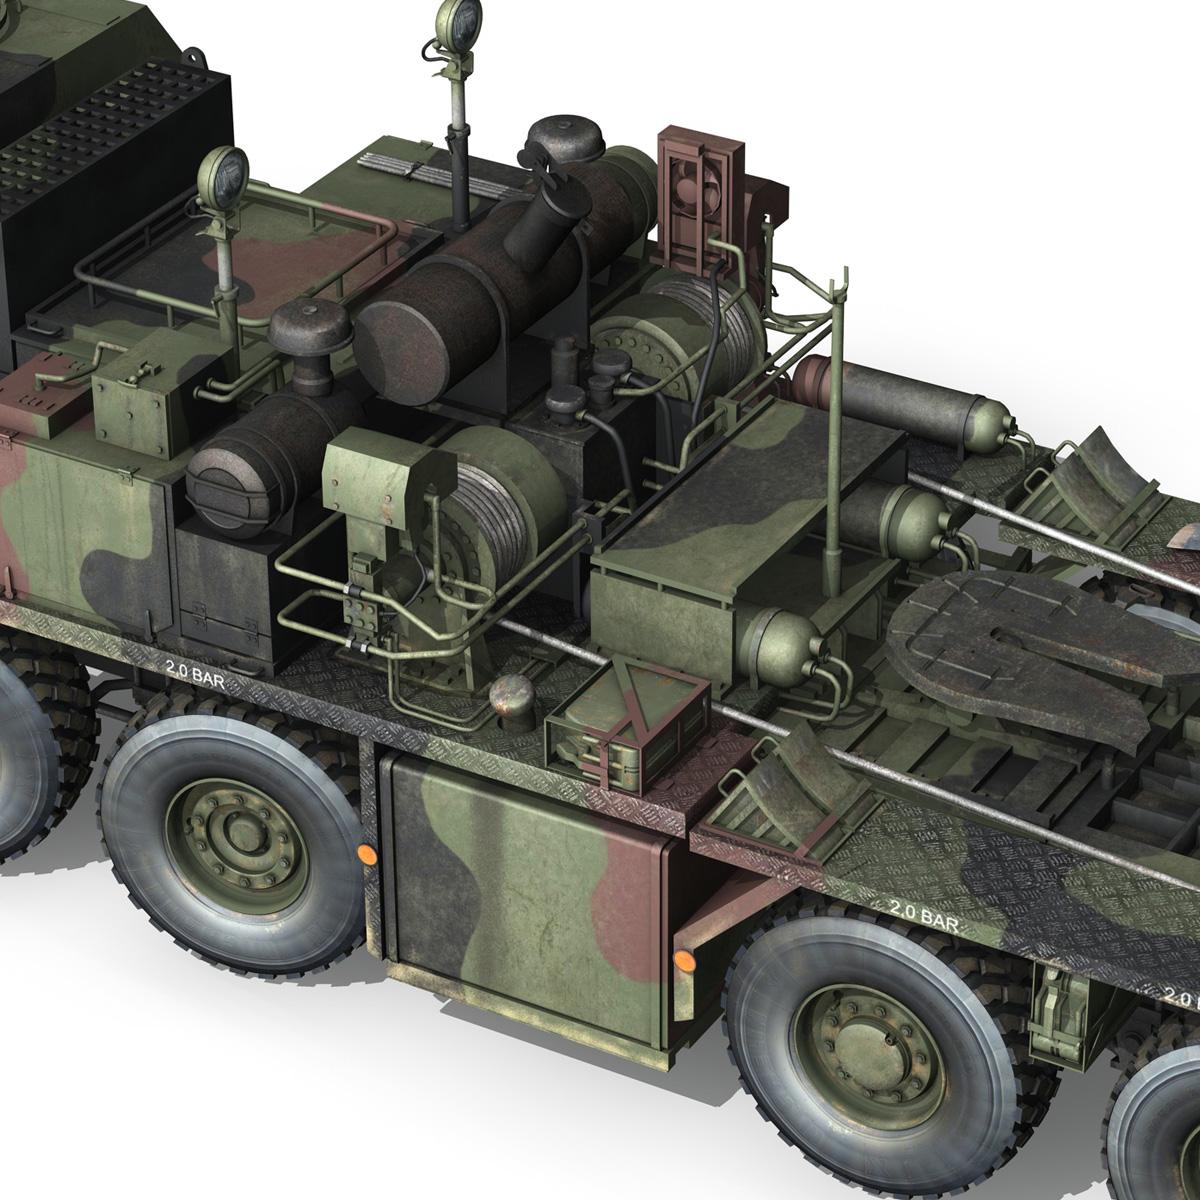 faun stl-56 transportues tank 3d model 3ds fbx c4d lwo obj 201920